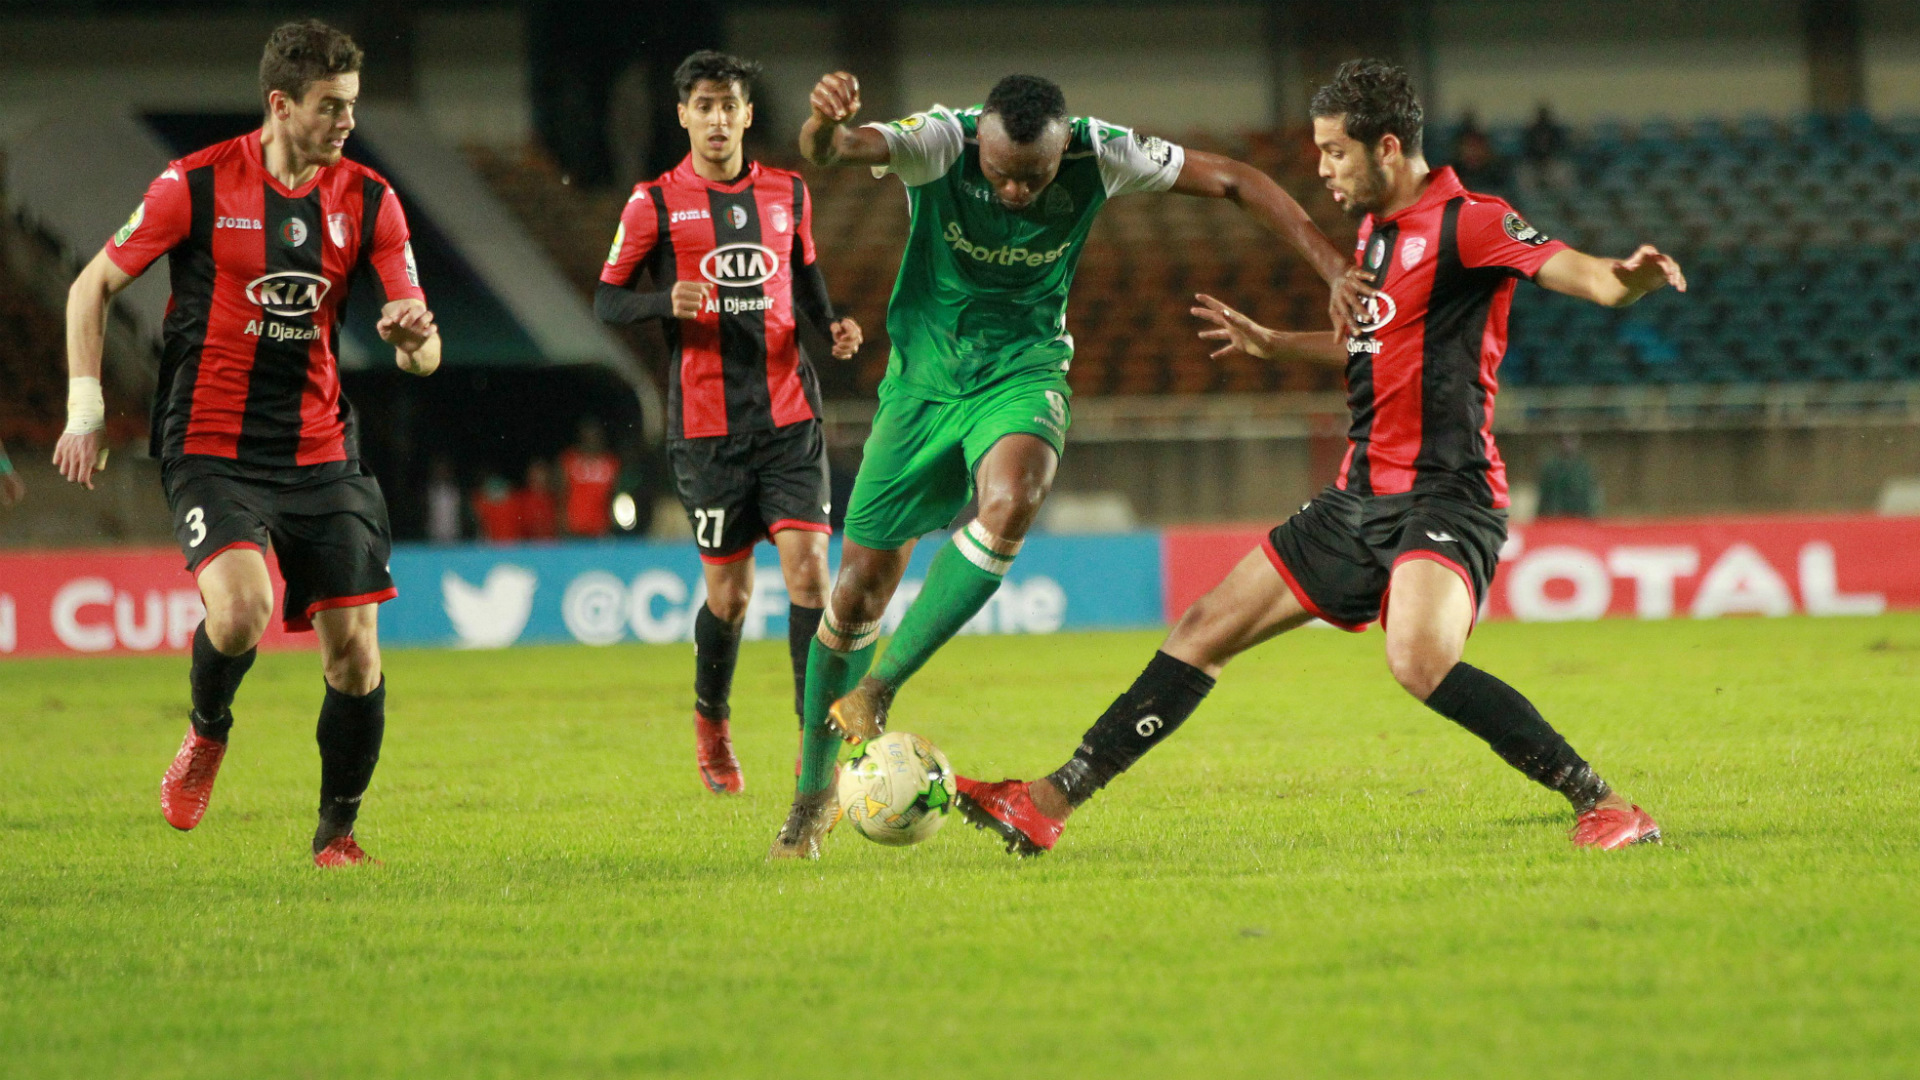 Gor Mahia striker Jacques Tuyisenge with ball against USM Alger.